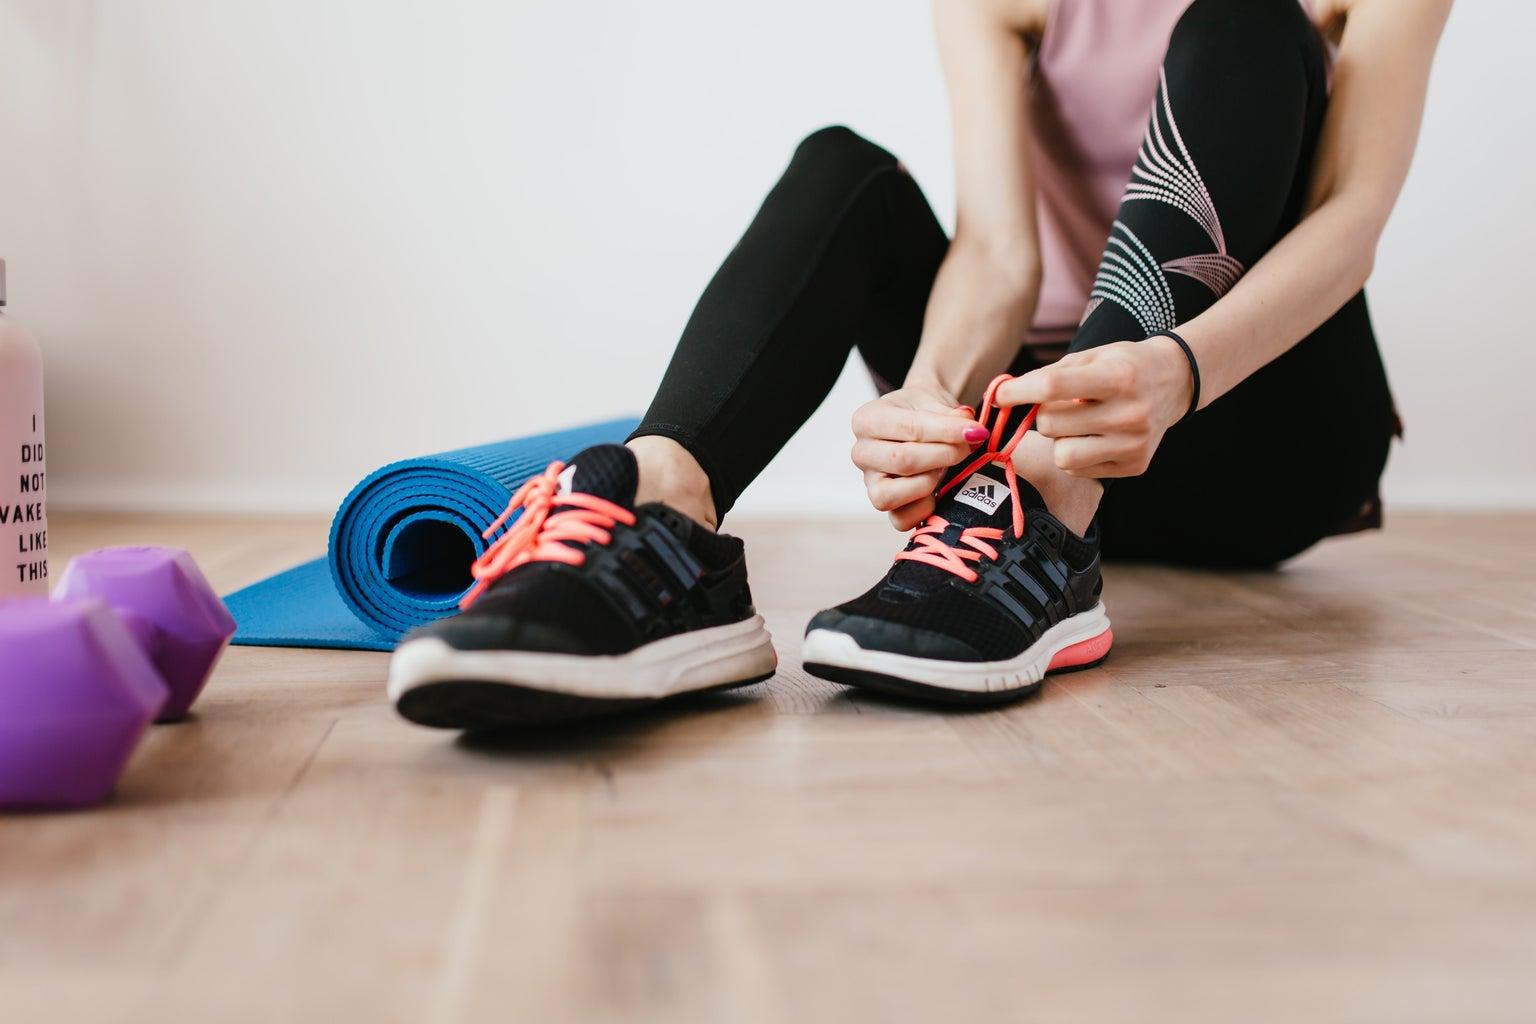 woman tying running shoelaces